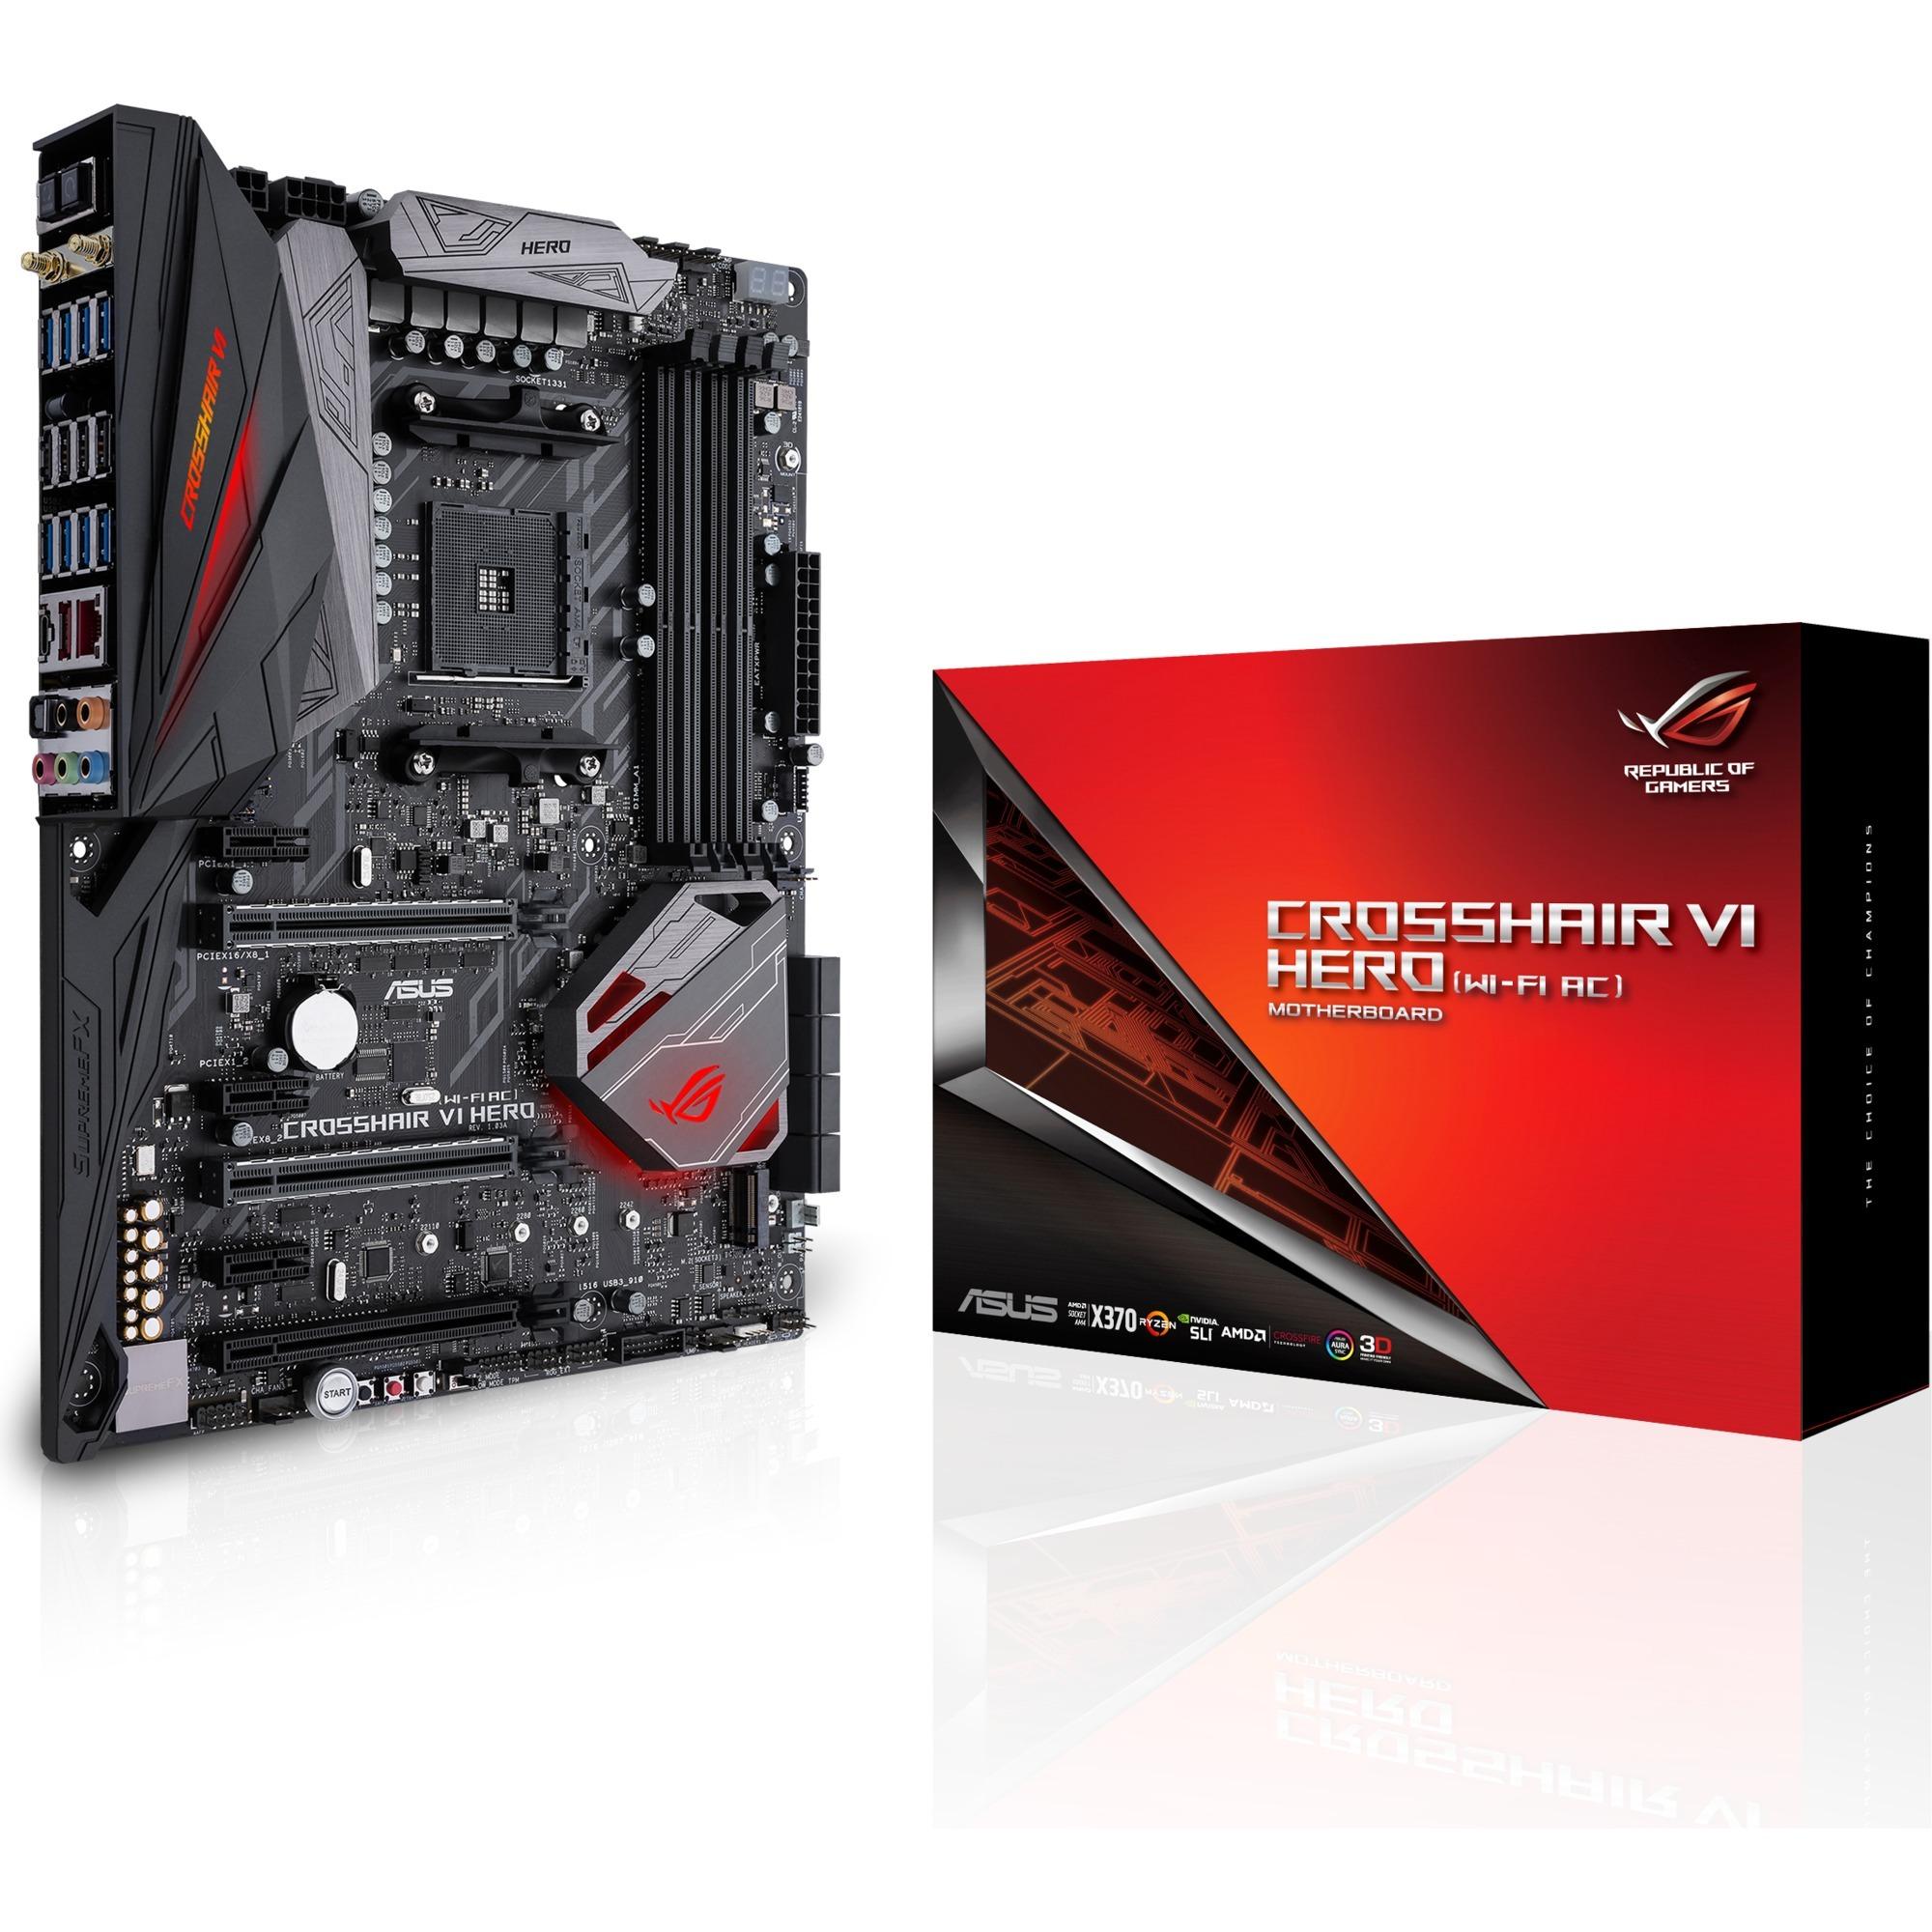 ROG CROSSHAIR VI HERO (WI-FI AC) AMD X370 Socket AM4 ATX carte mère